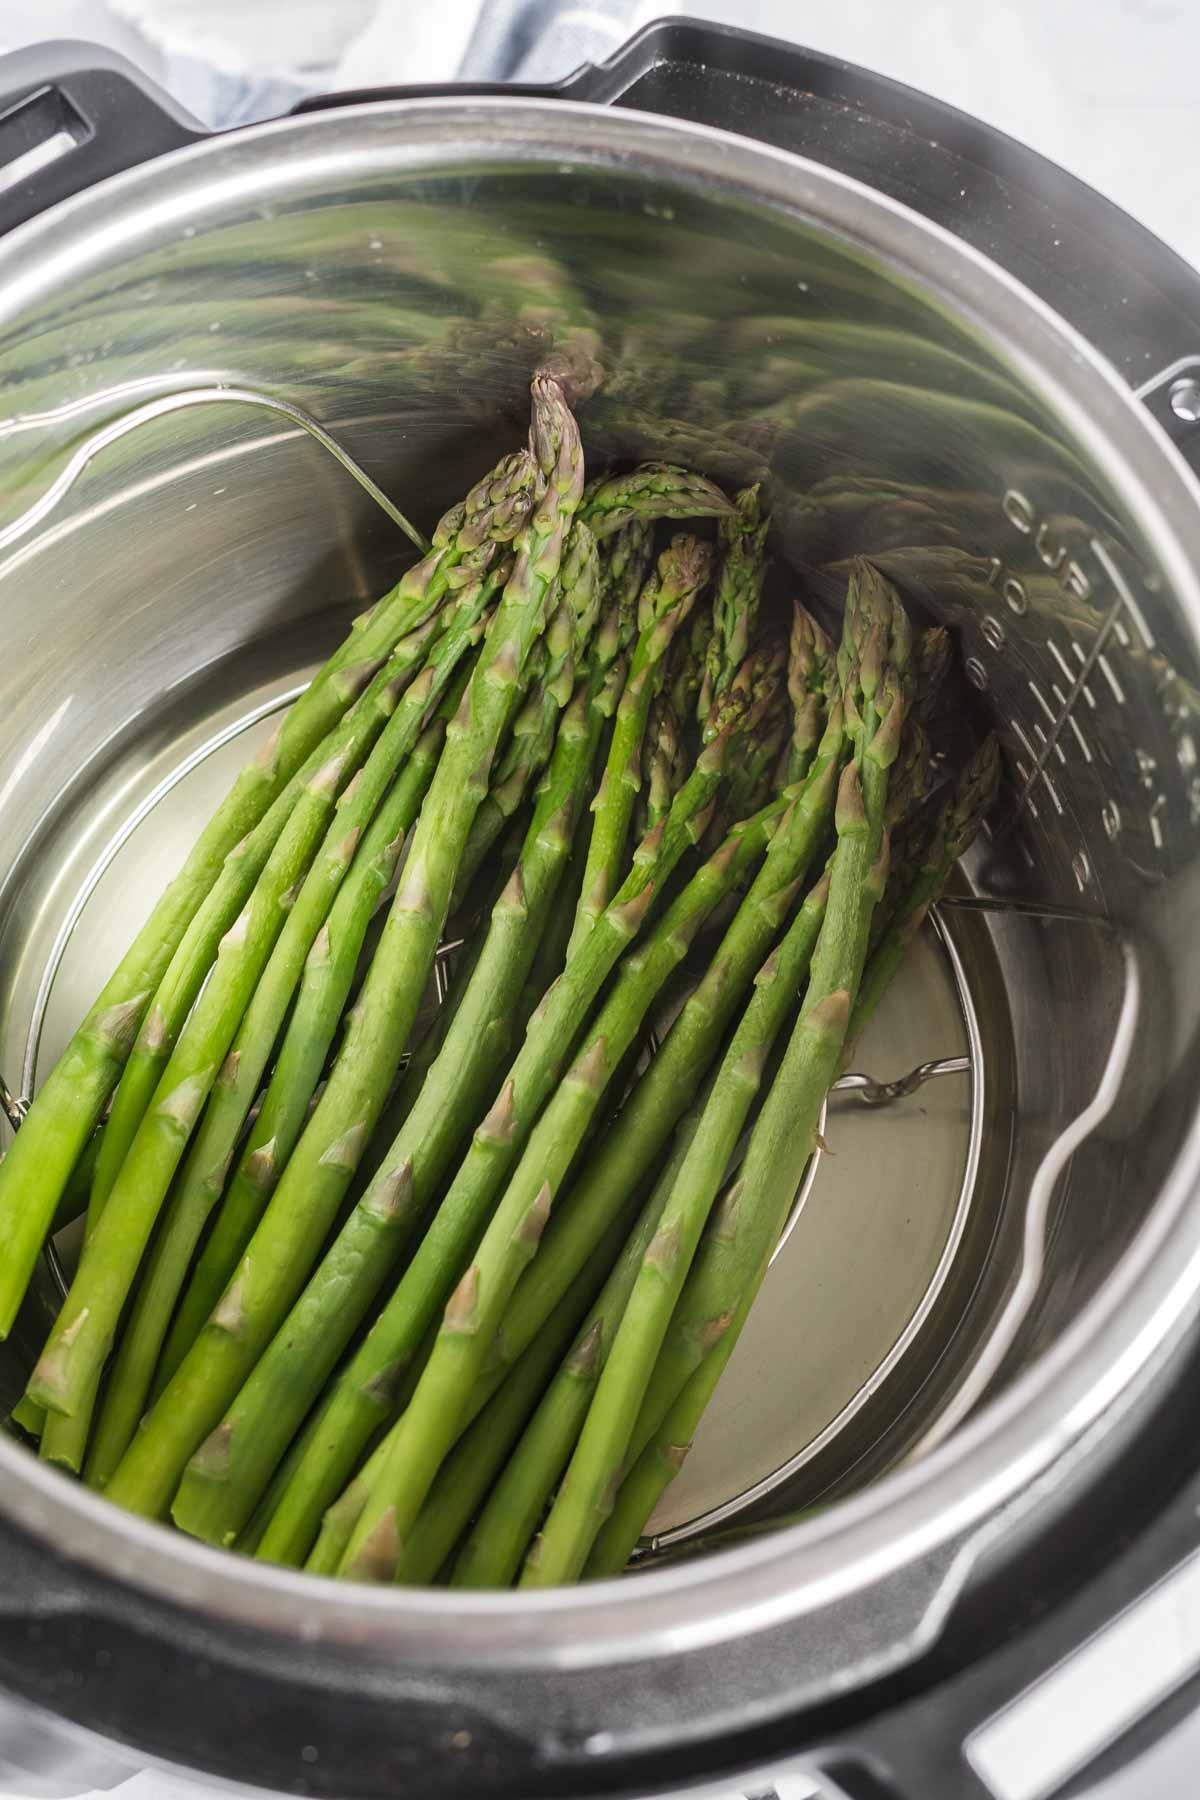 Asparagus on a trivet inside an instant pot.